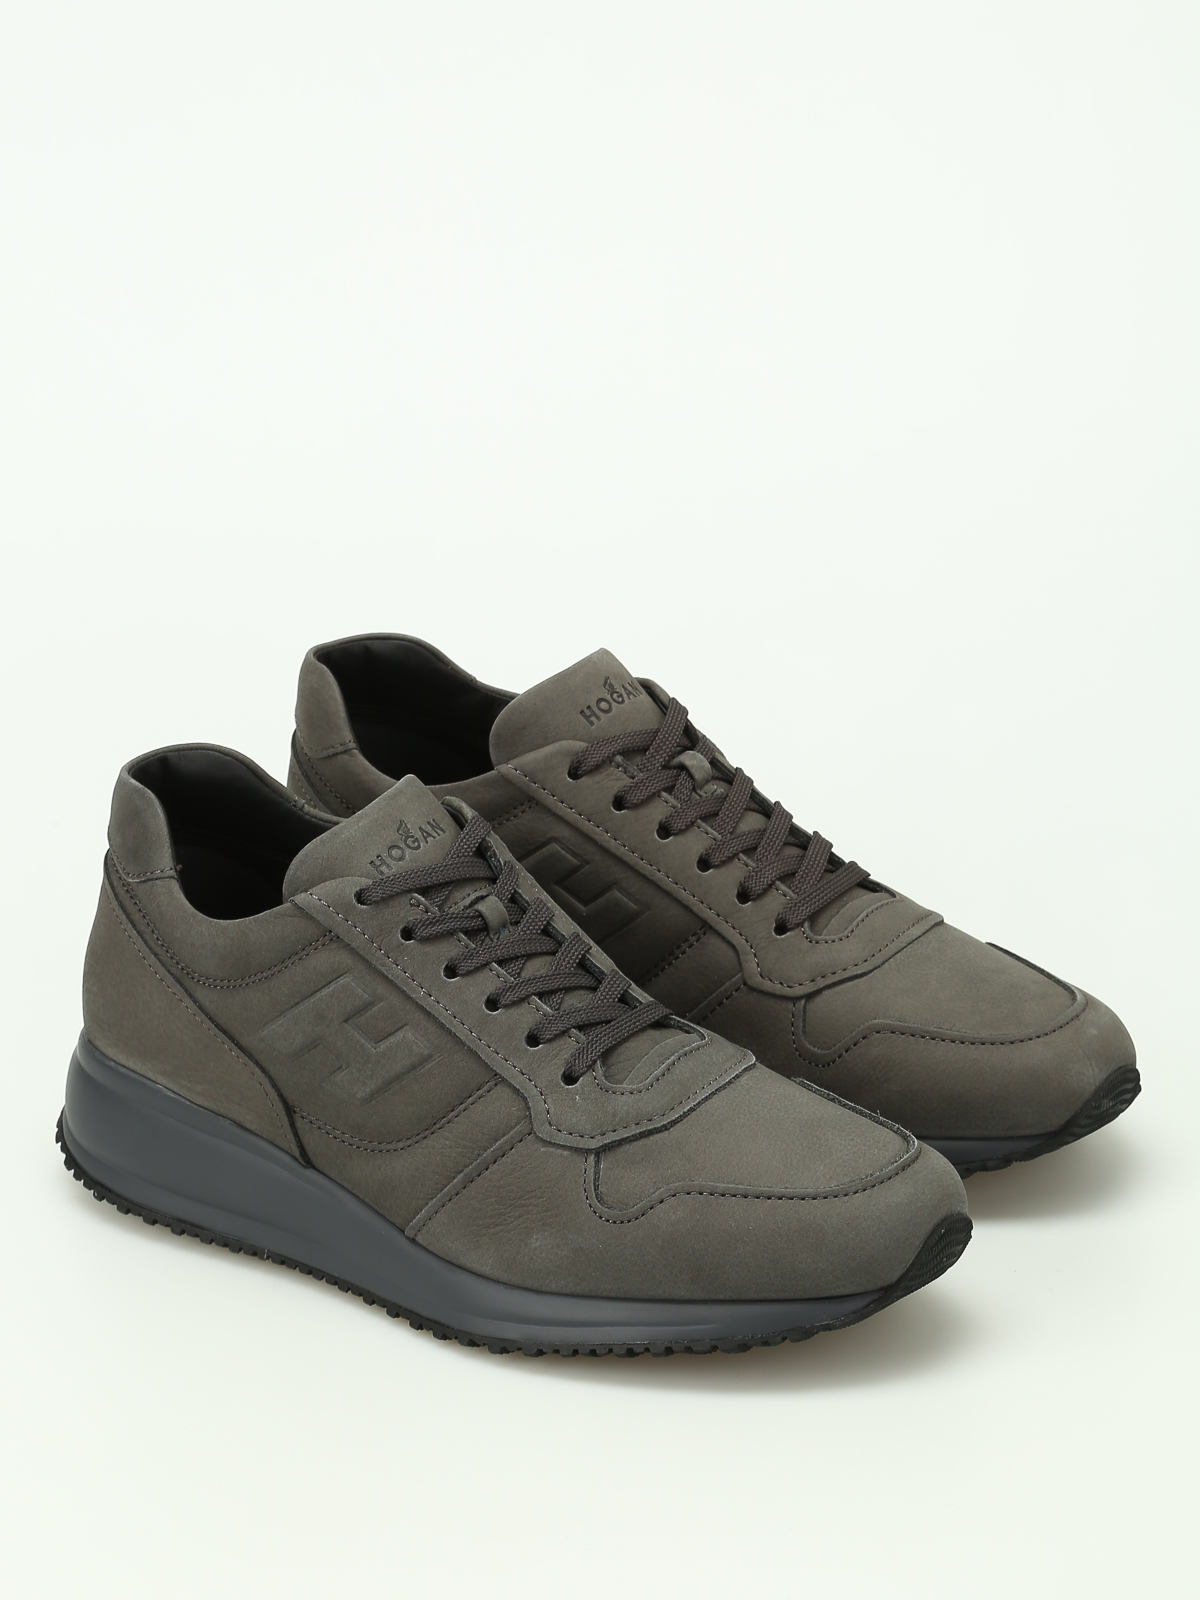 Trainers Hogan - Interactive N20 leather sneakers - HXM2460Y7806RNB612